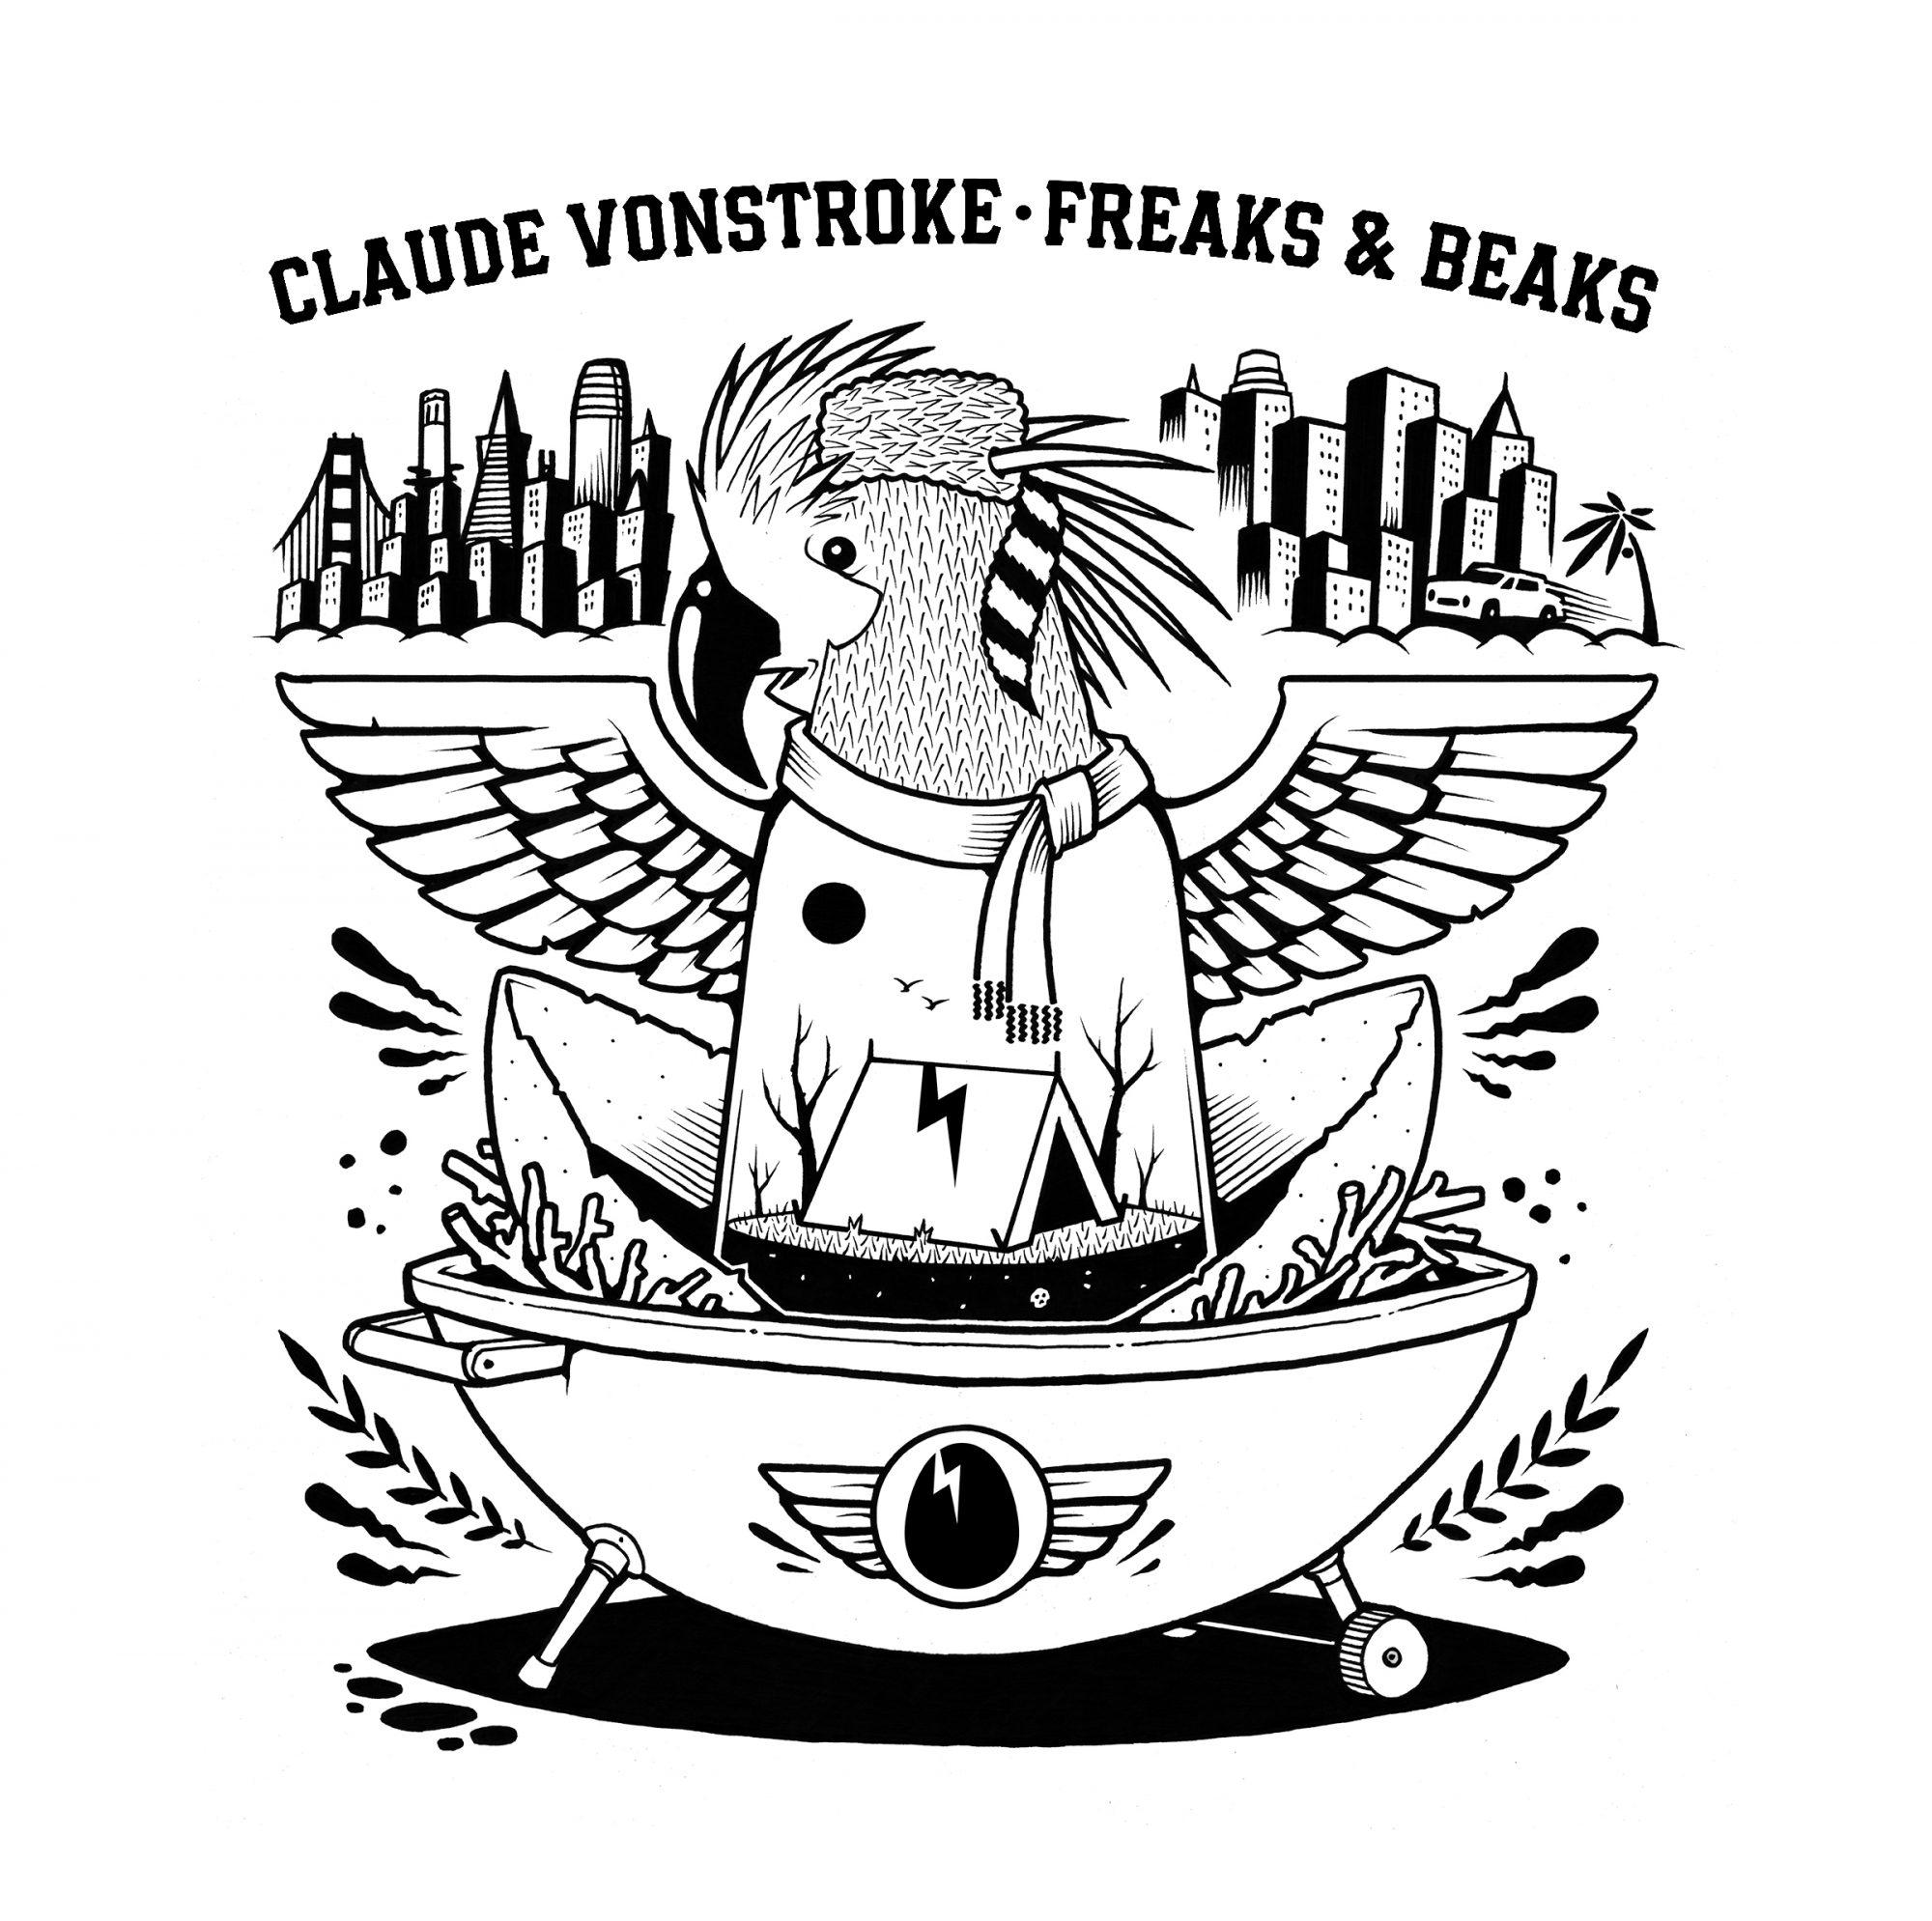 Claude VonStroke - Freaks and Beaks Album Cover